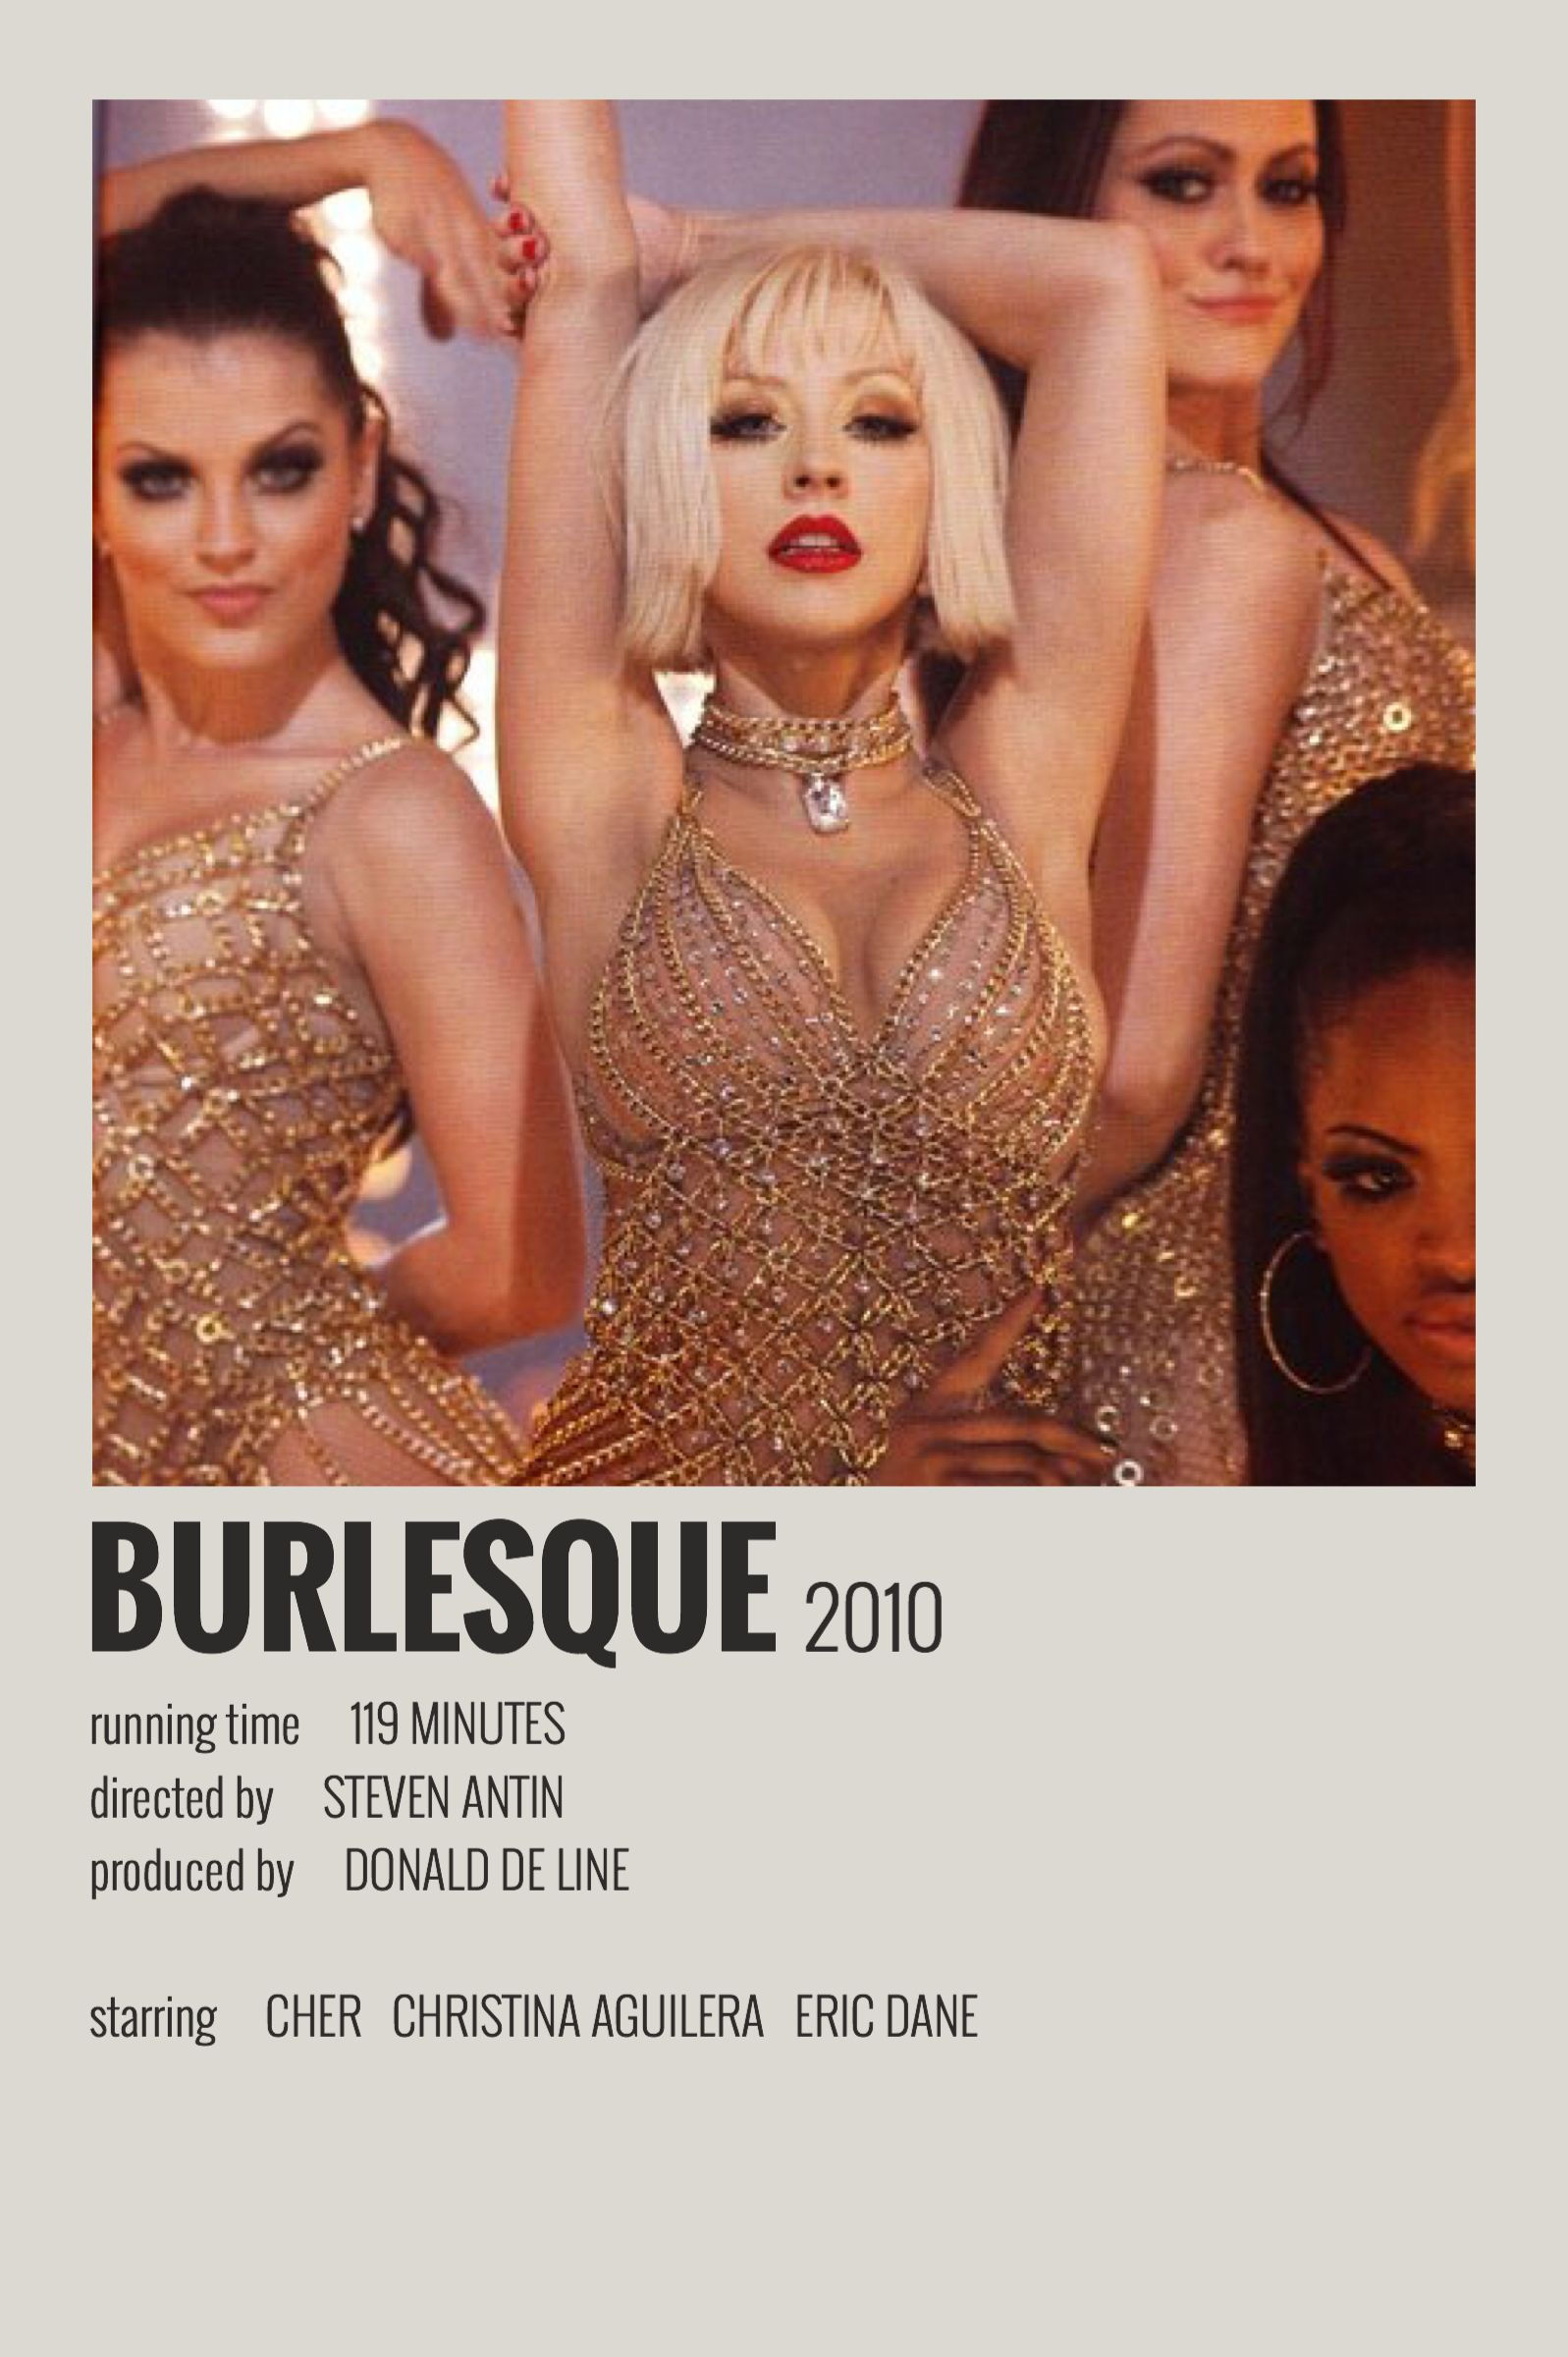 Alternative Minimalist Movie/Show Polaroid Poster - Burlesque